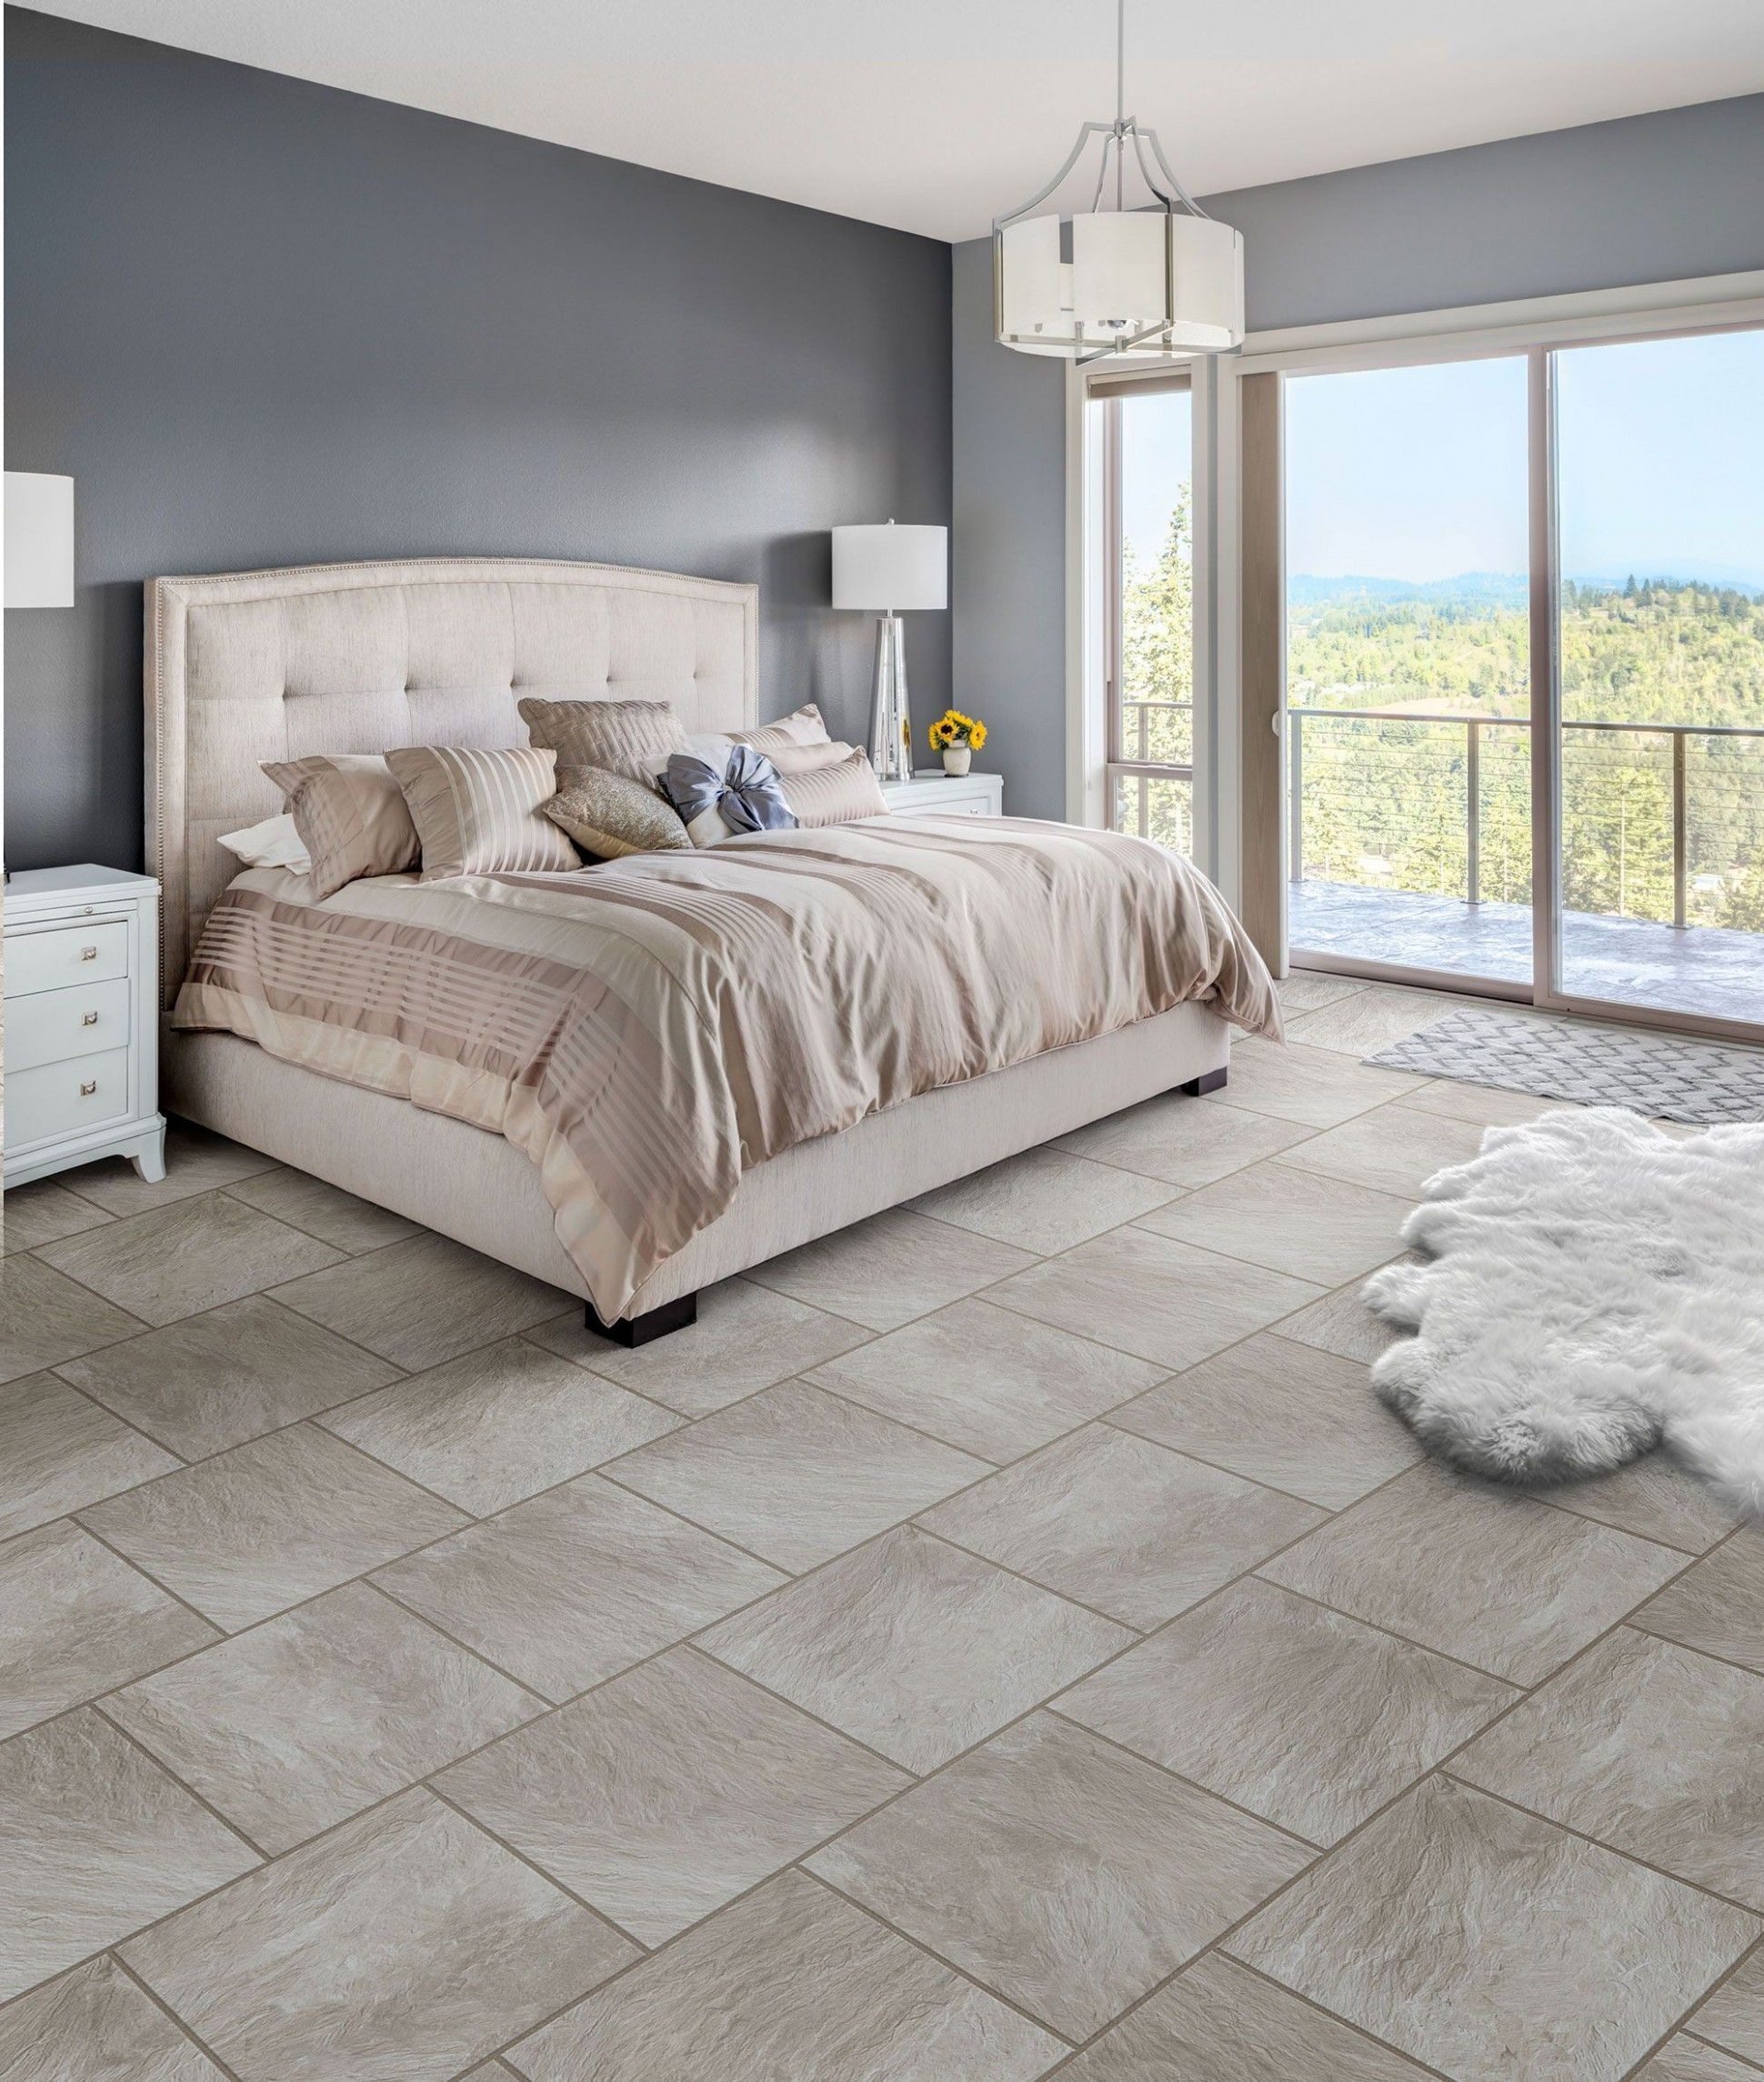 Vinyl Flooring Bedroom Ideas Vinyl Flooring Bedroom Ideas Manasquan N J Dec 13 2019 Prnewswire Bedroom Flooring Vinyl Flooring Bedroom Interior